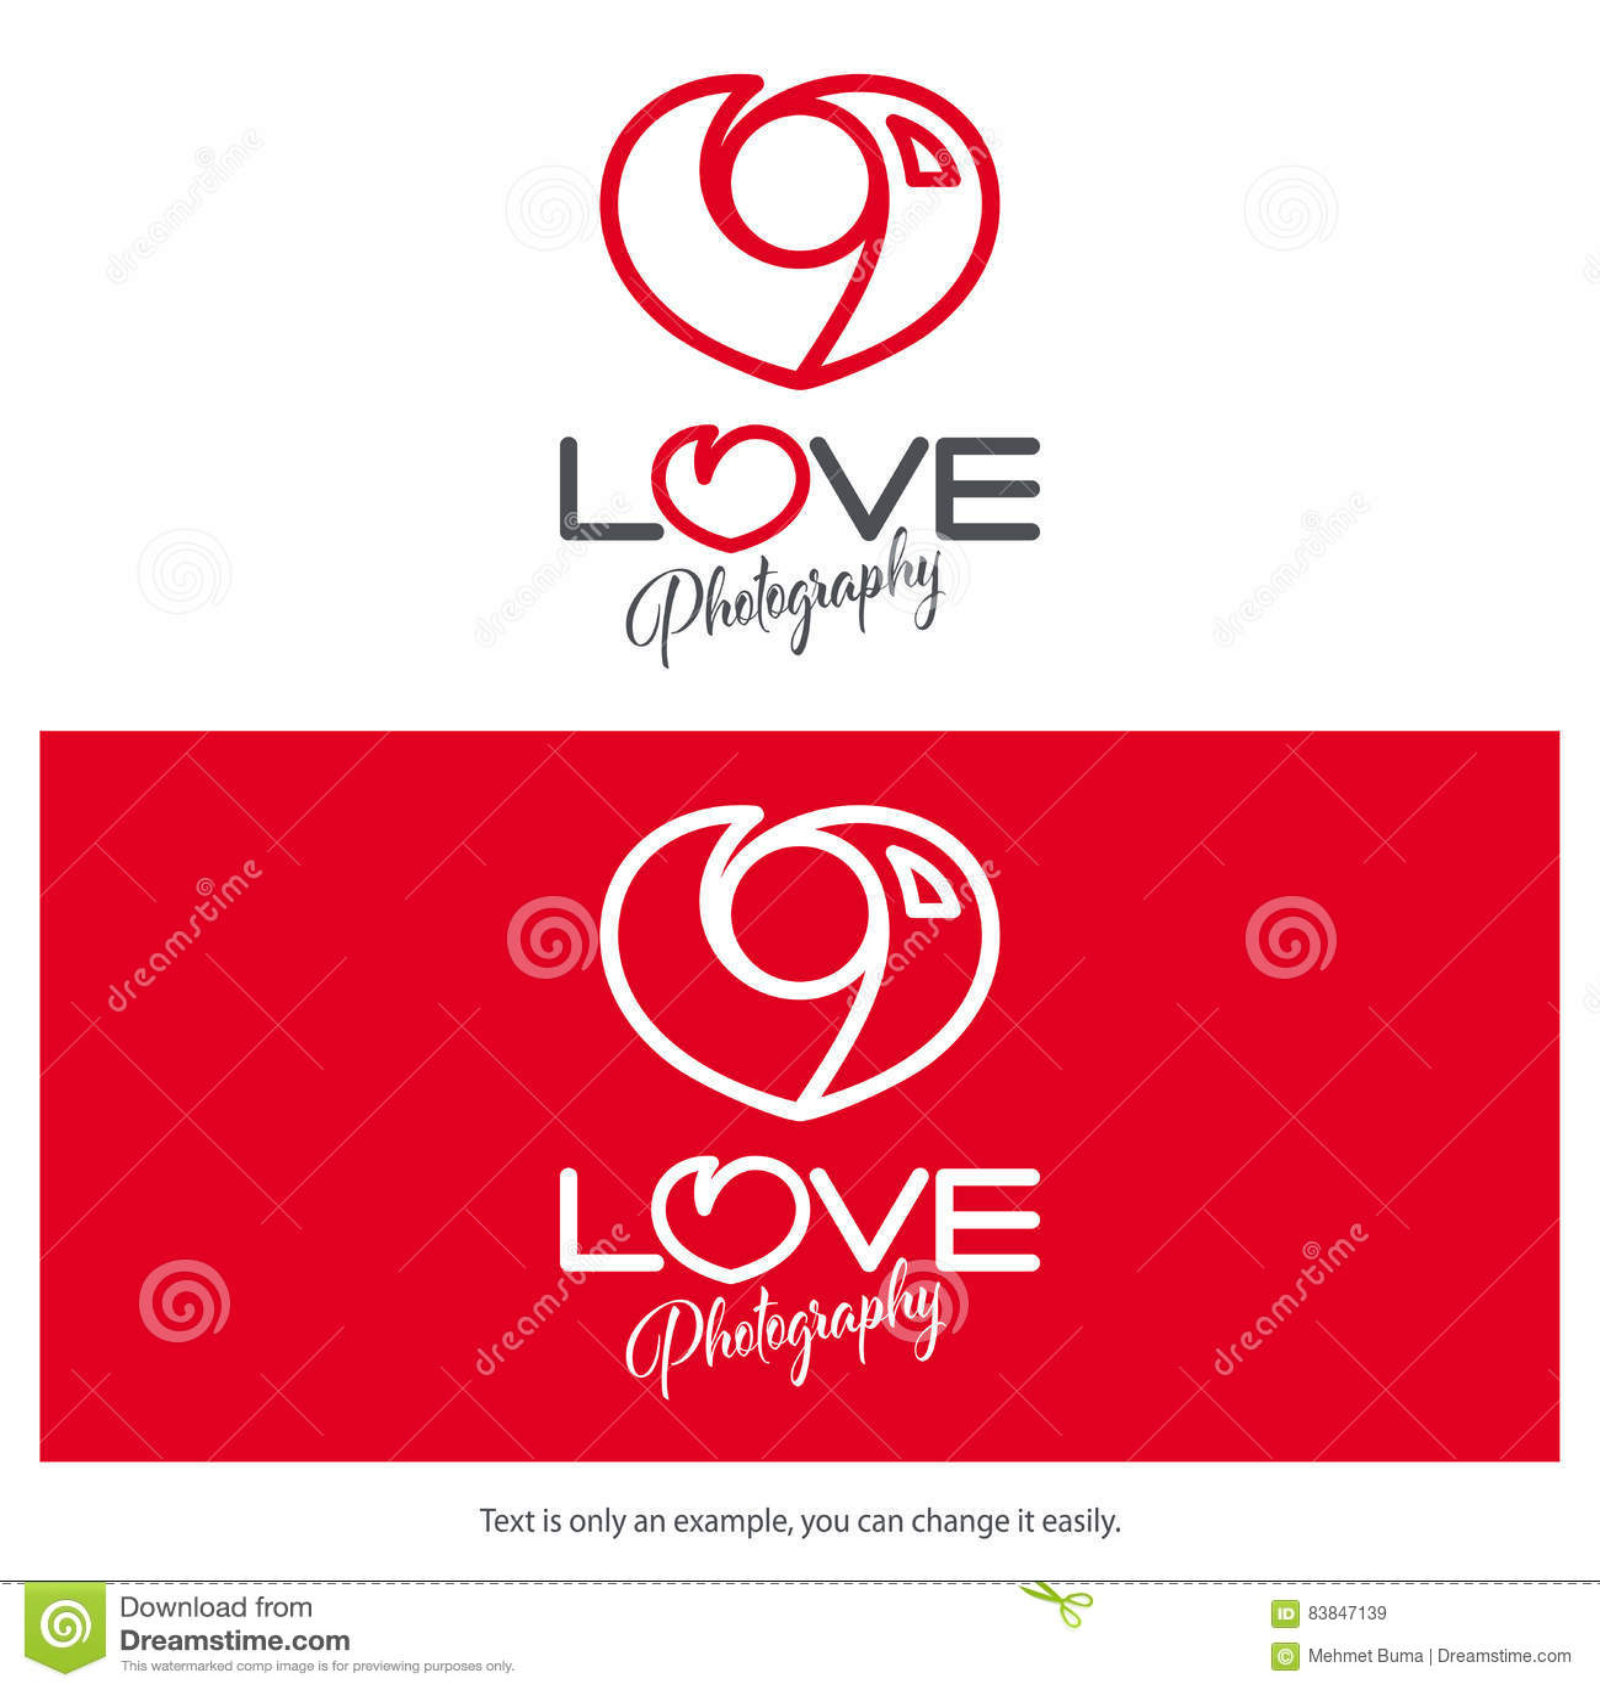 Love photography logo design. Minimal camera icon heart shaped.